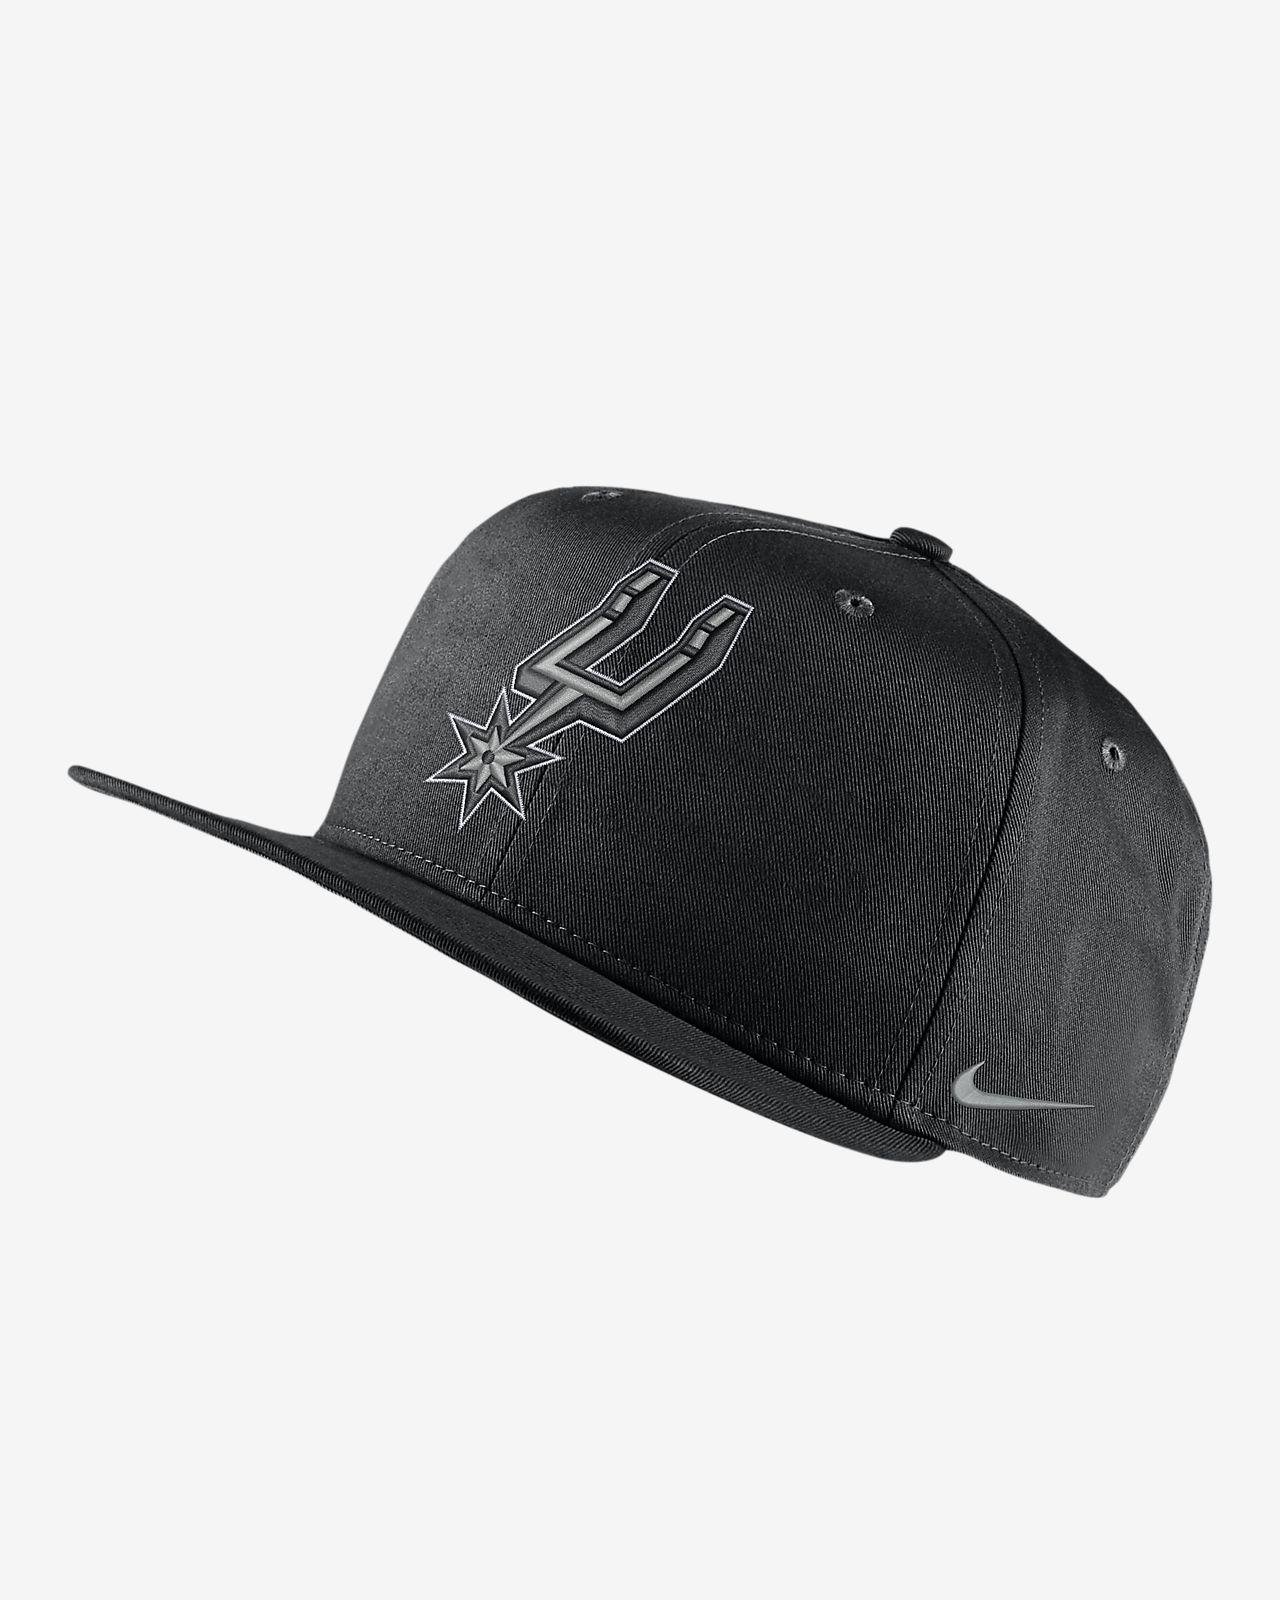 San Antonio Spurs Nike Pro-NBA-kasket